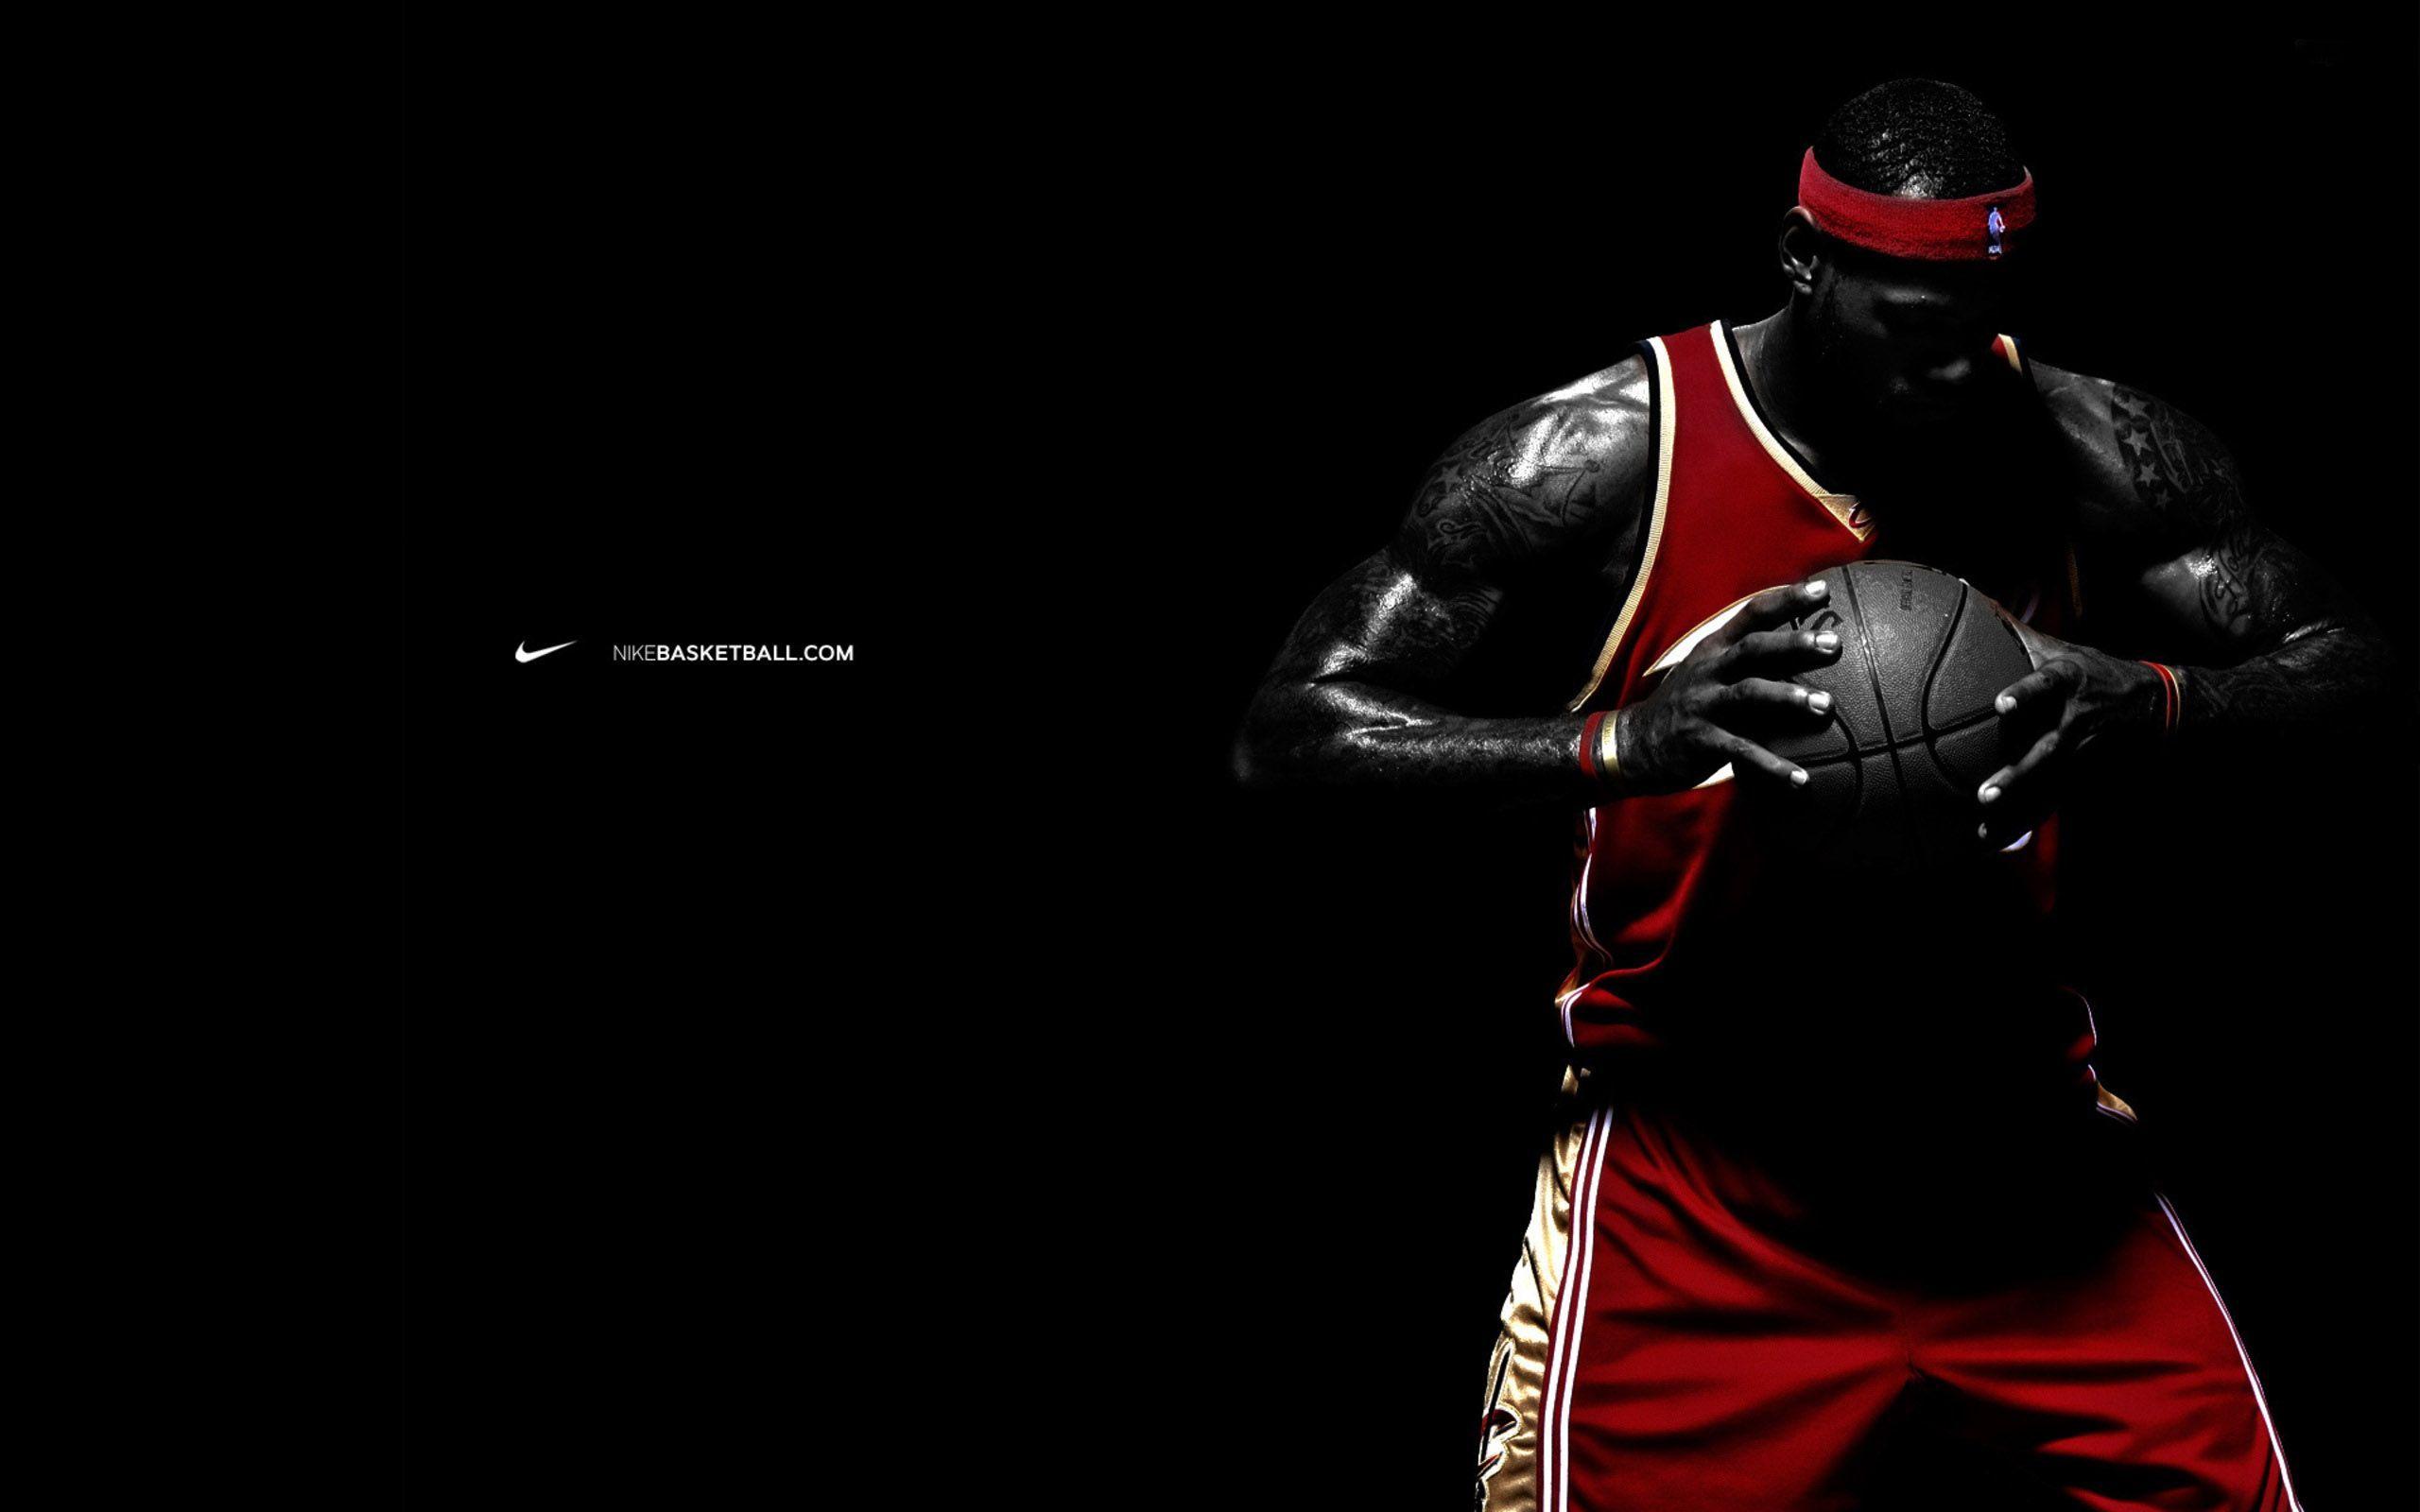 Coolest LeBron James Miami Heat 2013 Best HD  Desktop HD Wallpaper